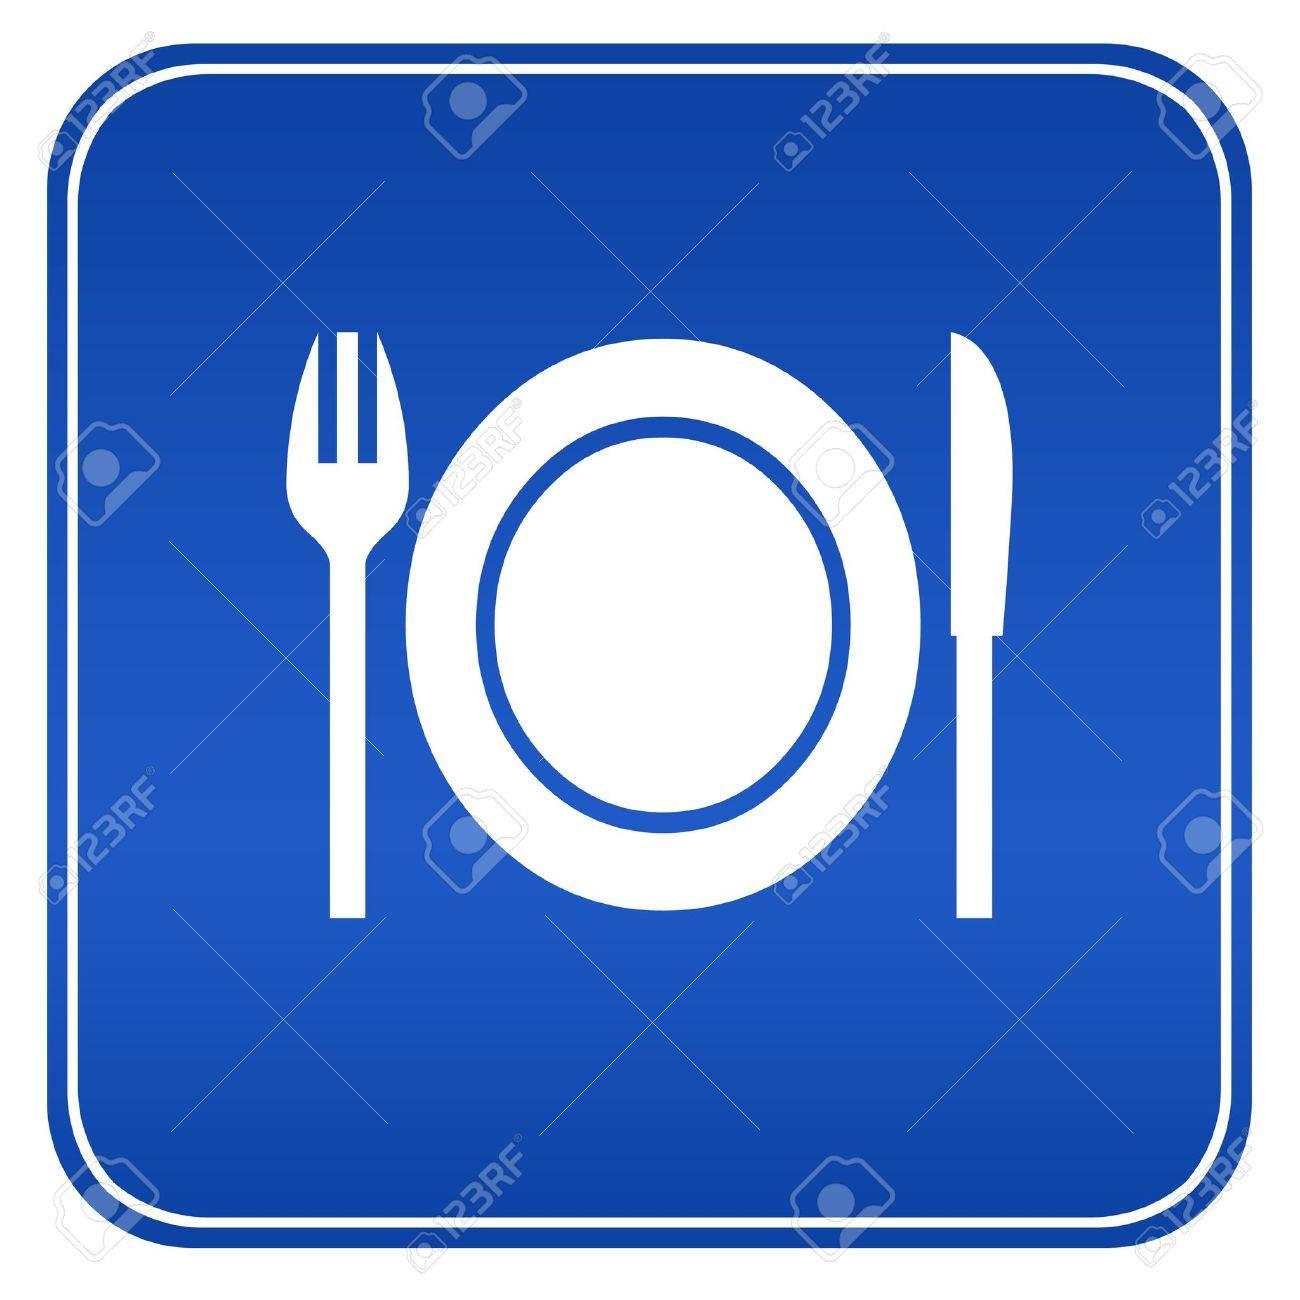 Restaurant blue sign Stock Photo - 9156422